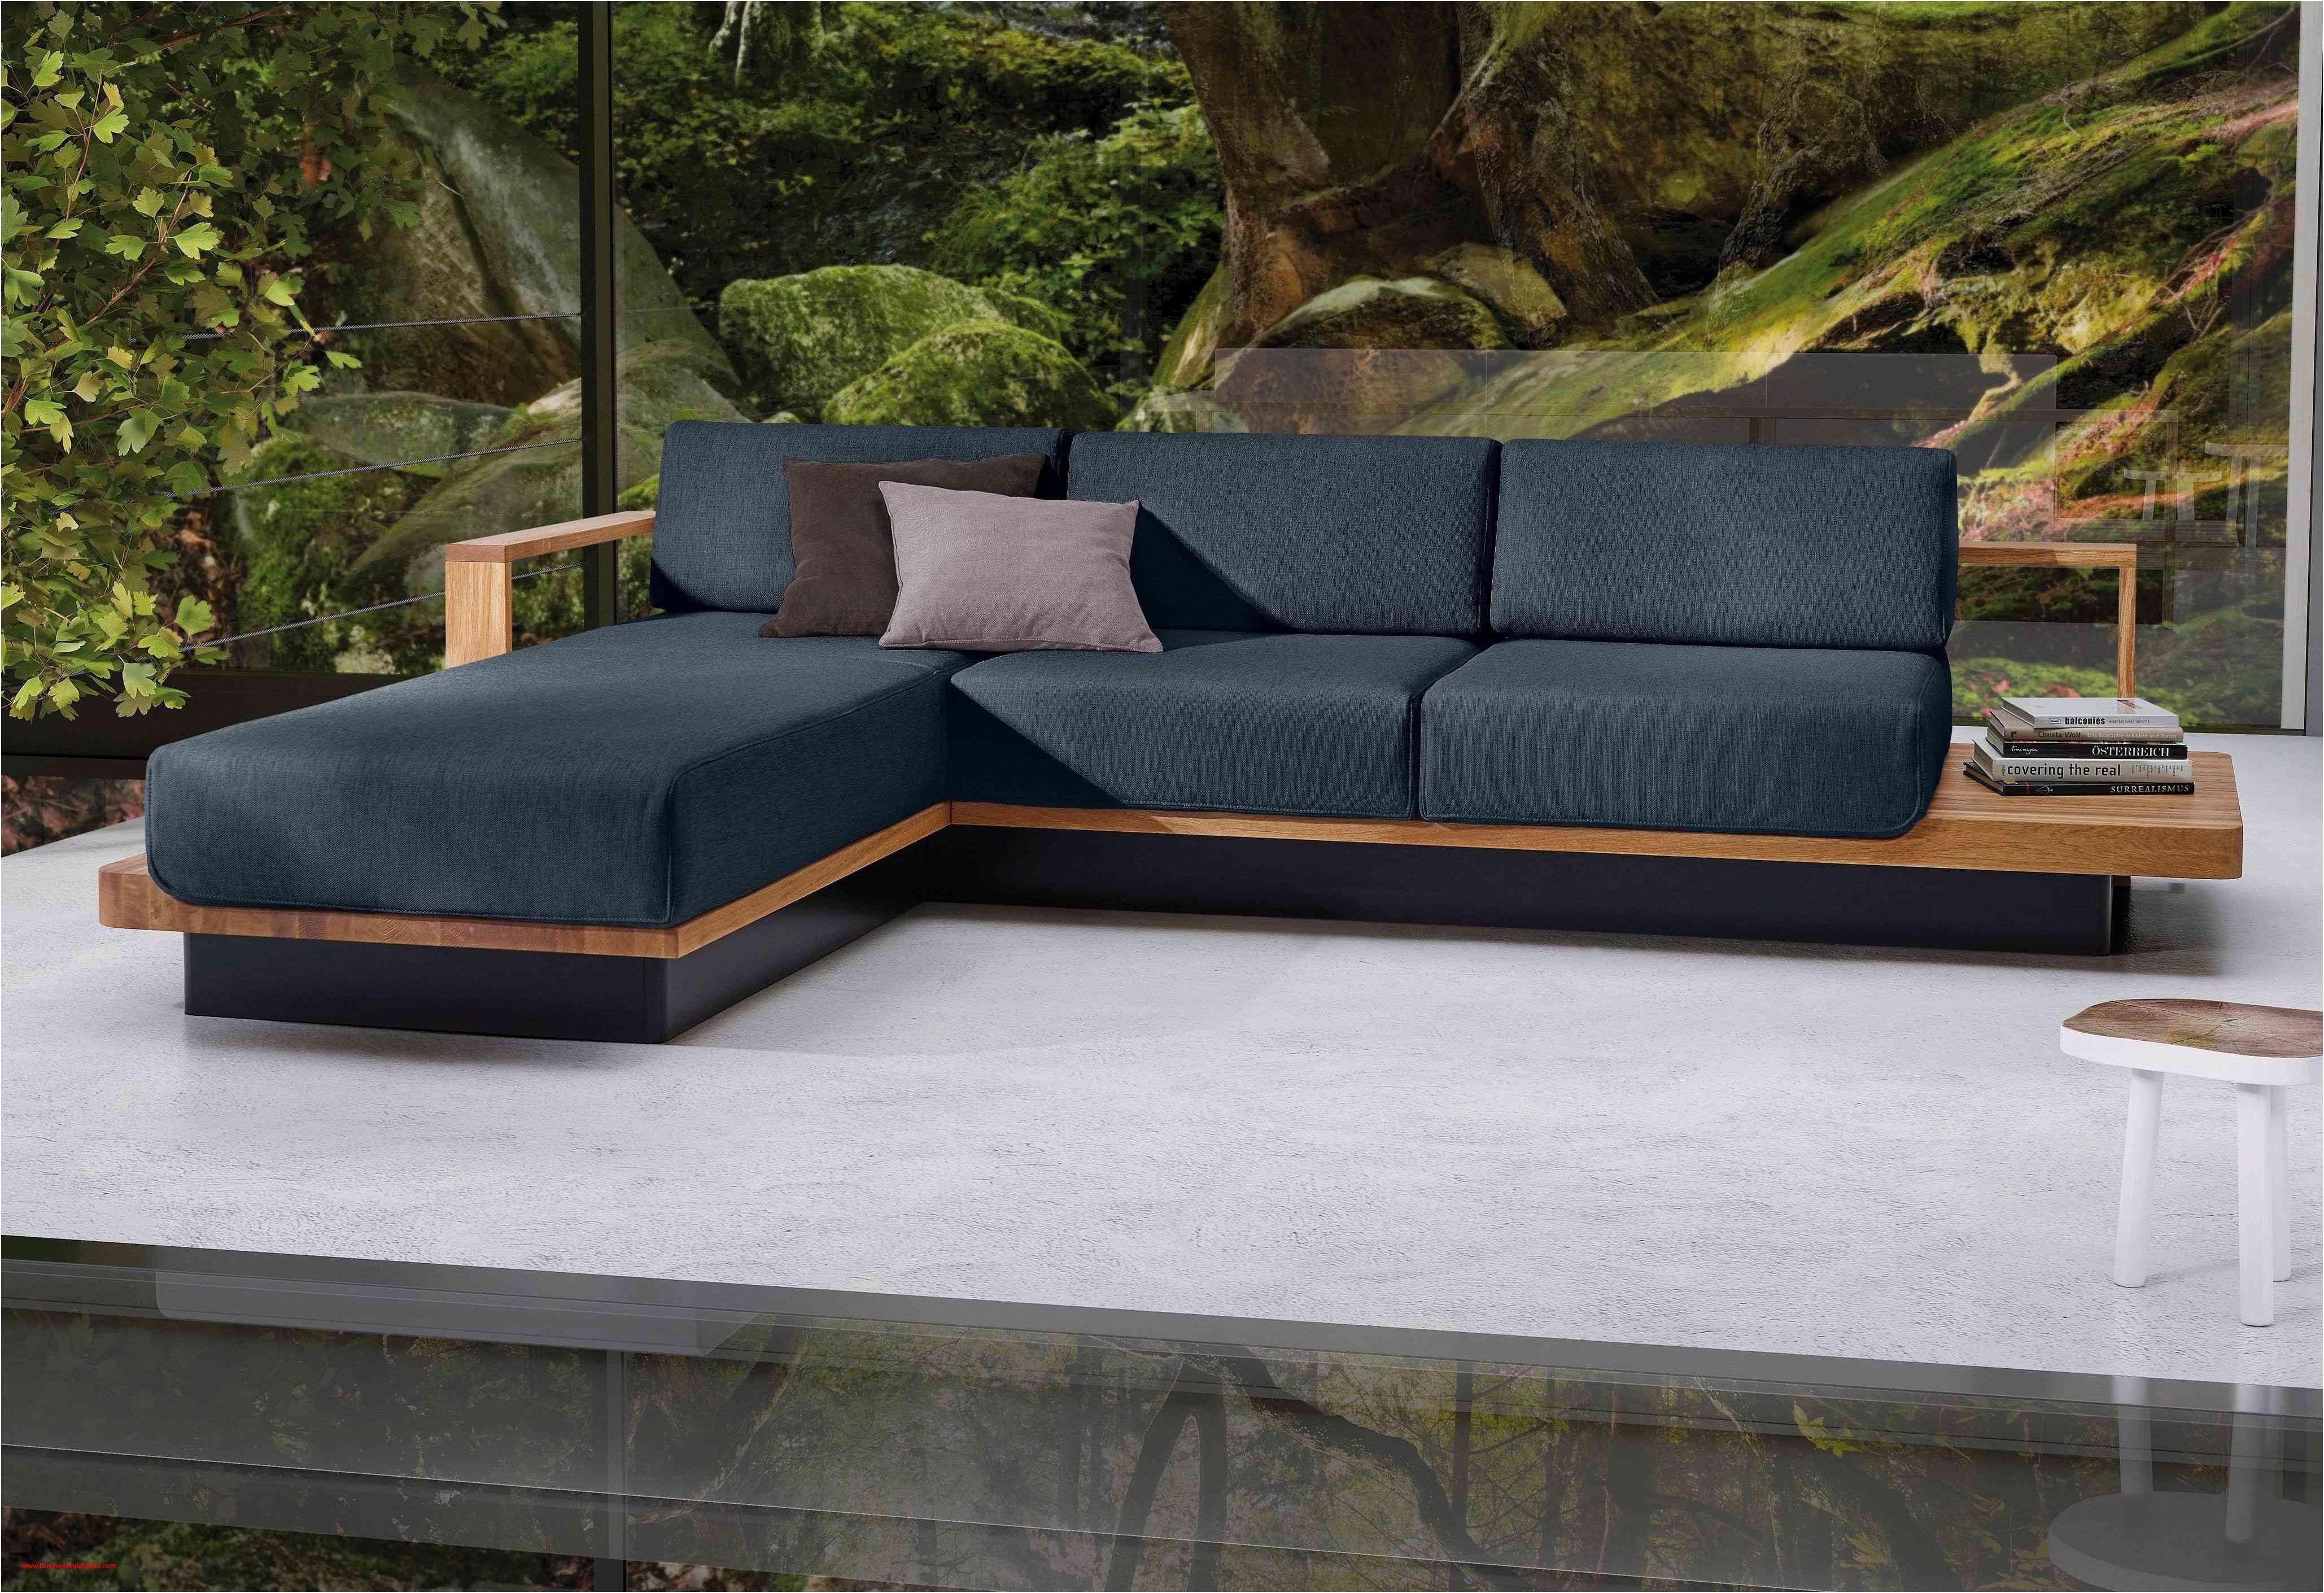 Staggering Ecksofa U Form In 2020 Sofa Design Wood Wooden Sofa Designs Outdoor Sofa Diy